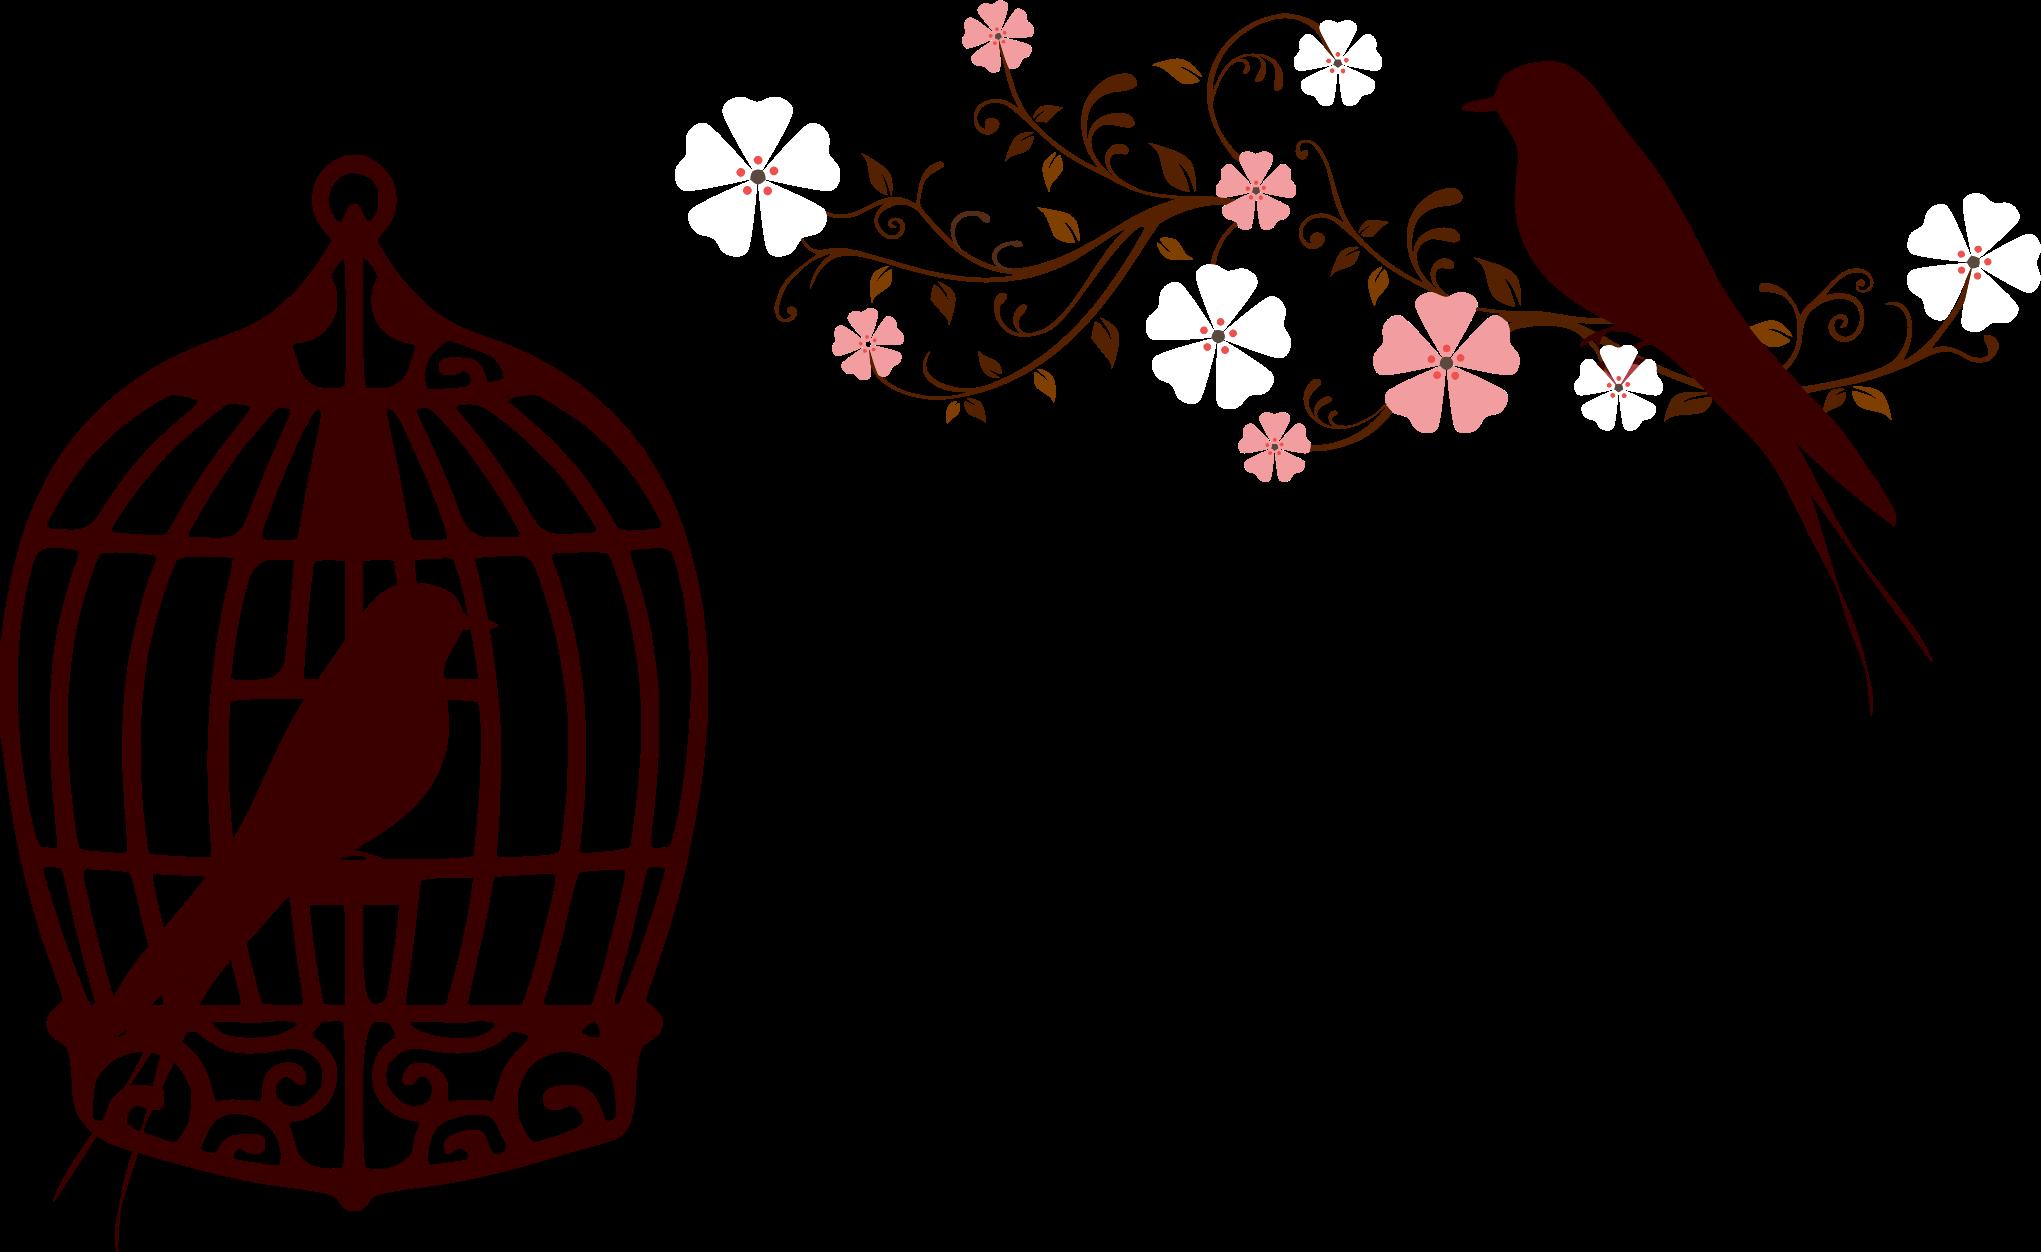 Floral birds silhouette no. Cage clipart transparent background